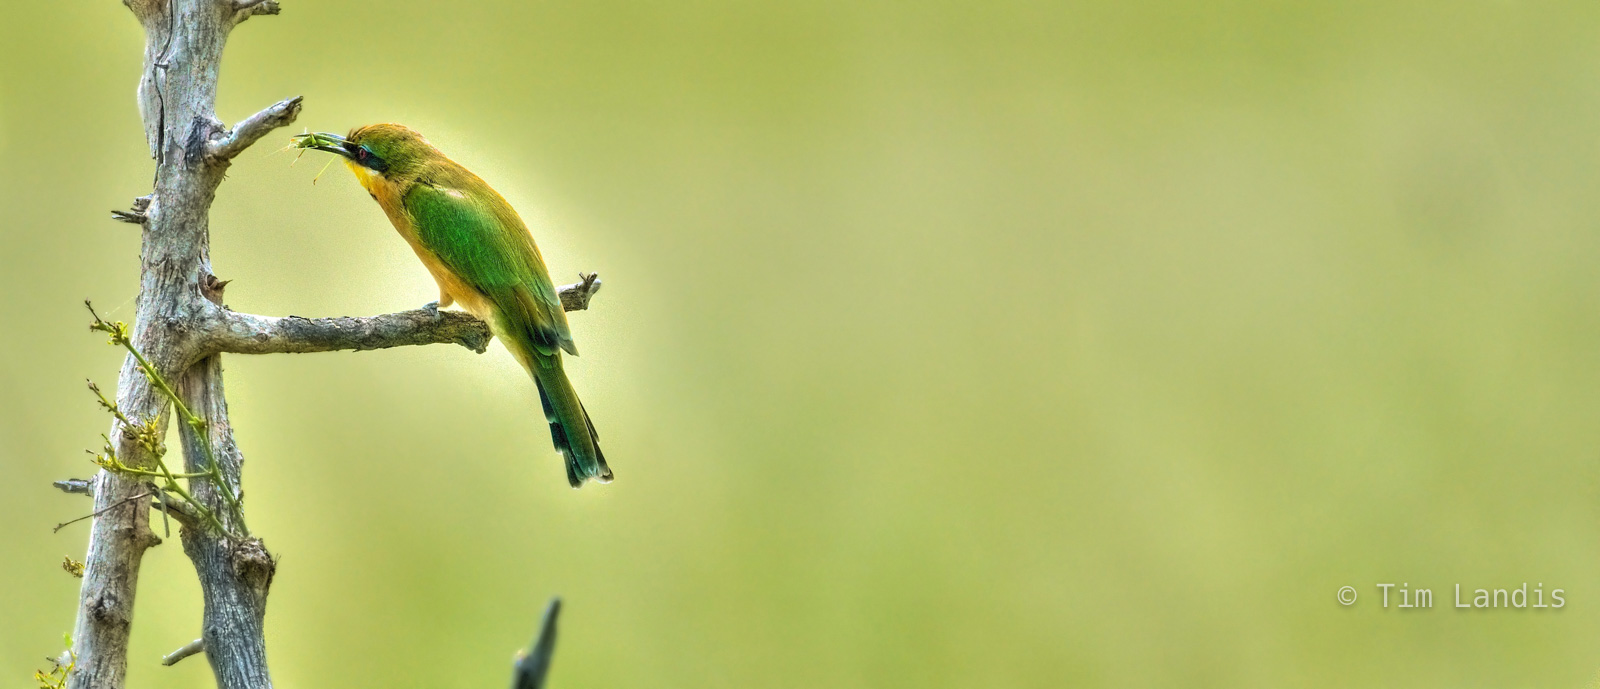 Botswanna, bee eater, bird eating katydid, bird with kill, chobe, exotic birds, photo